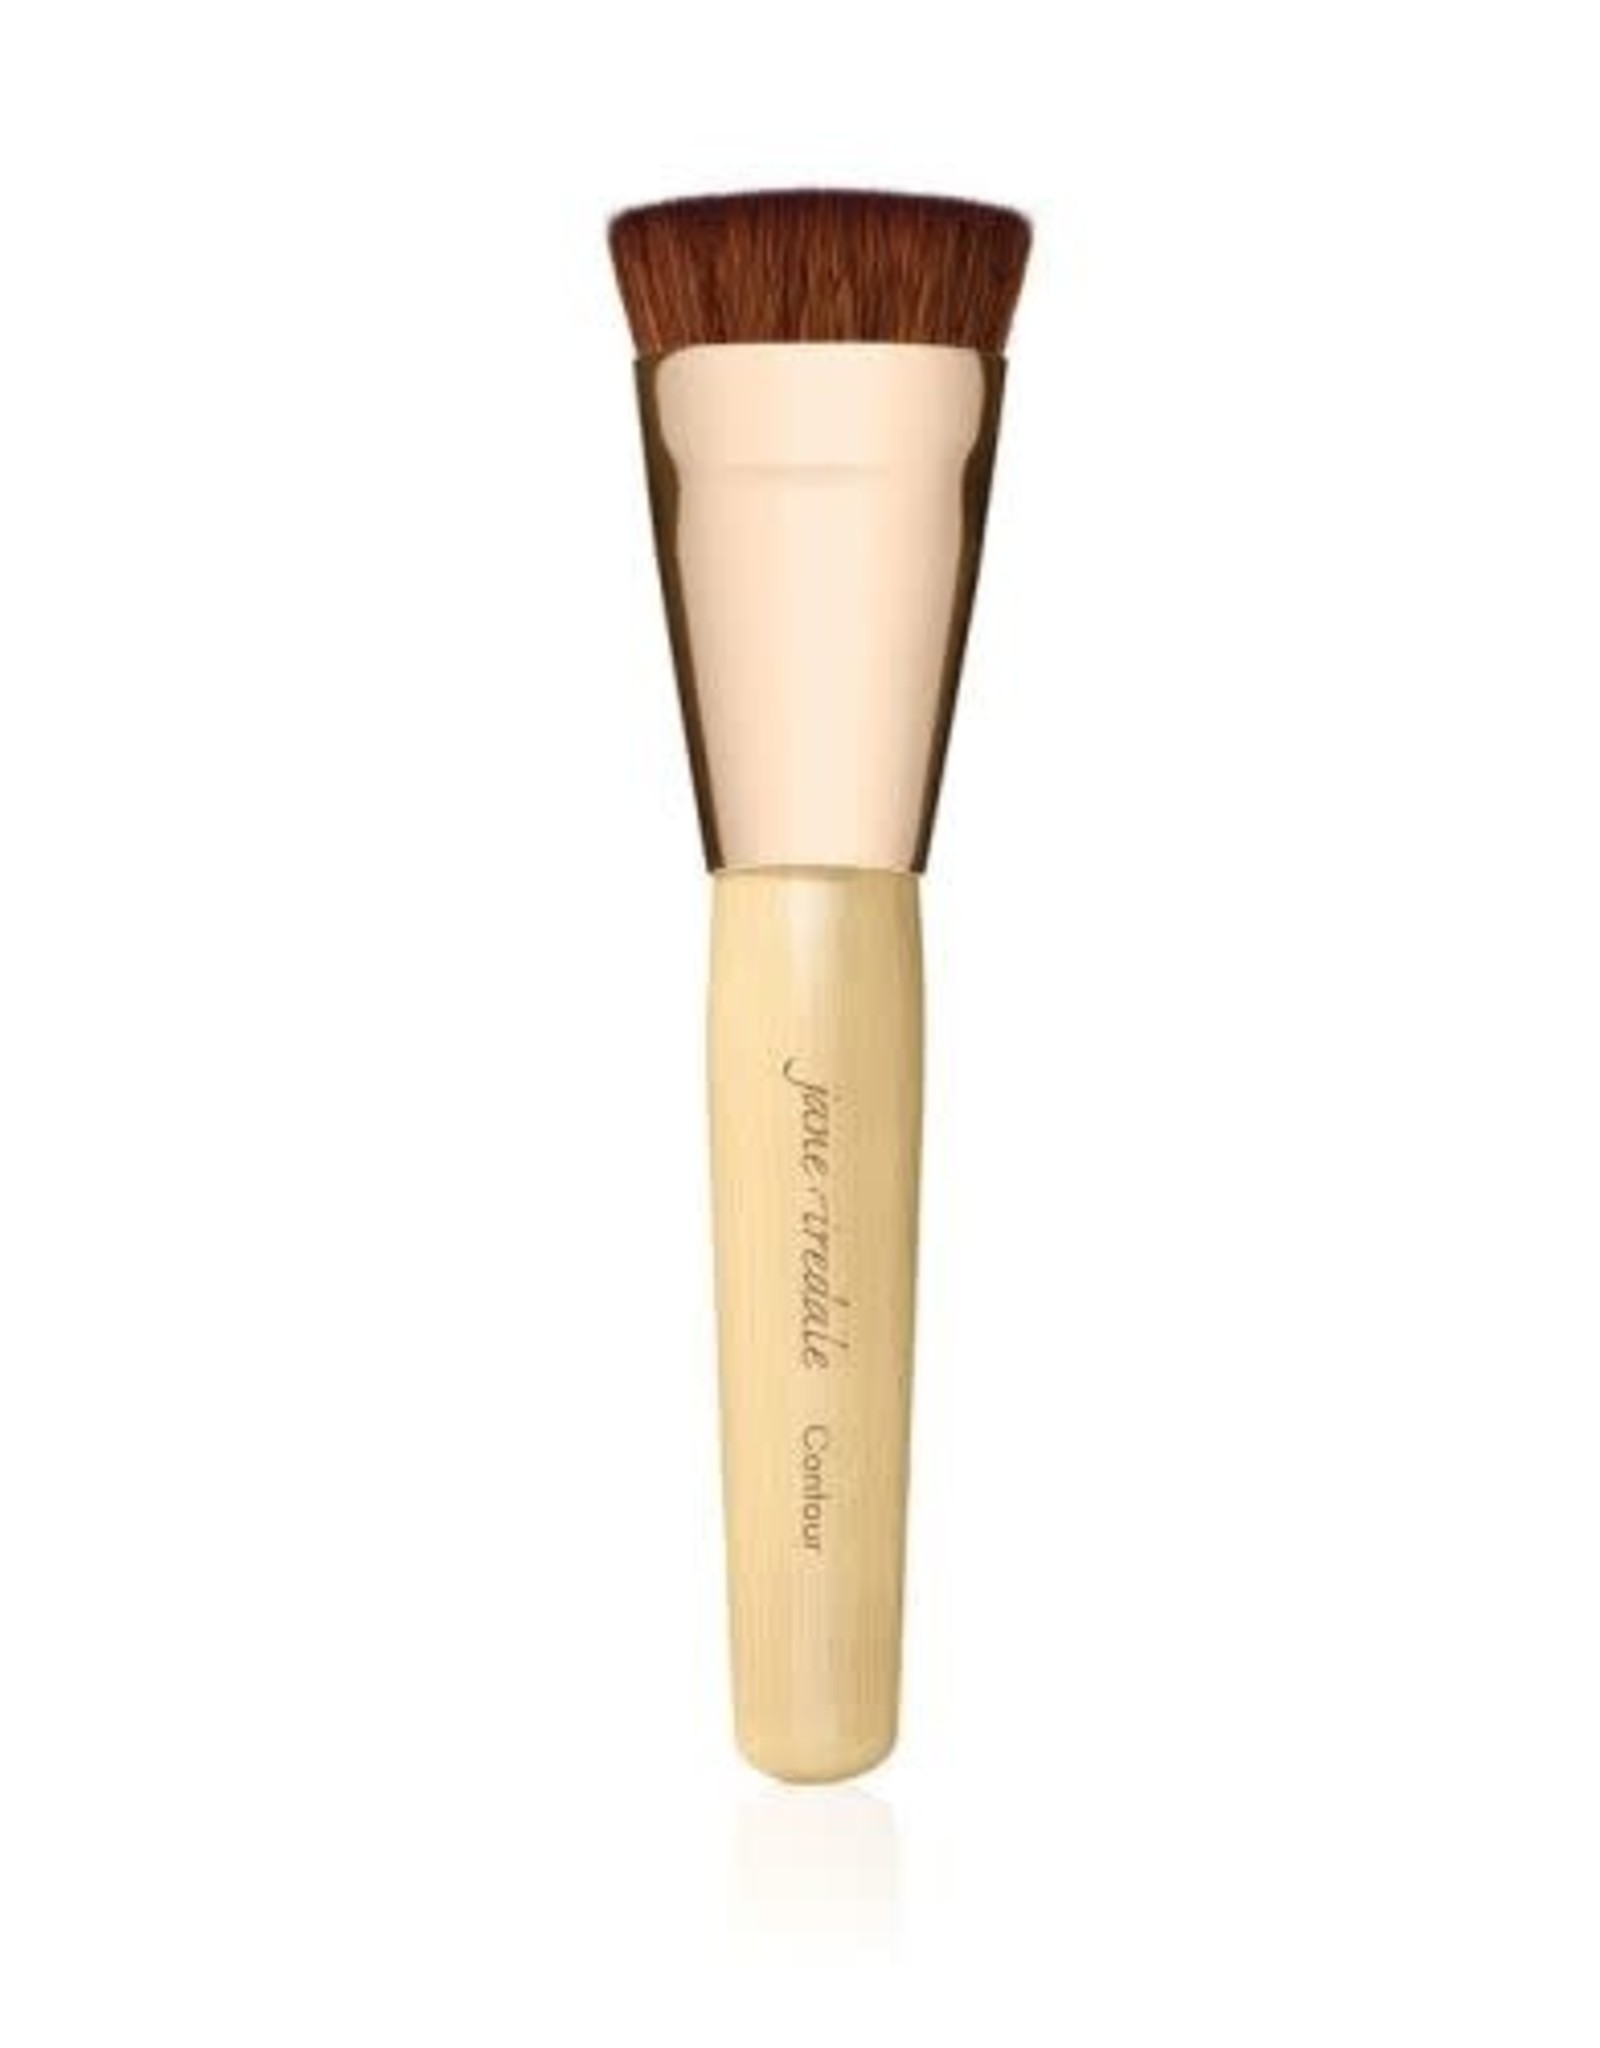 Jane Iredale Makeup Brush | Contour